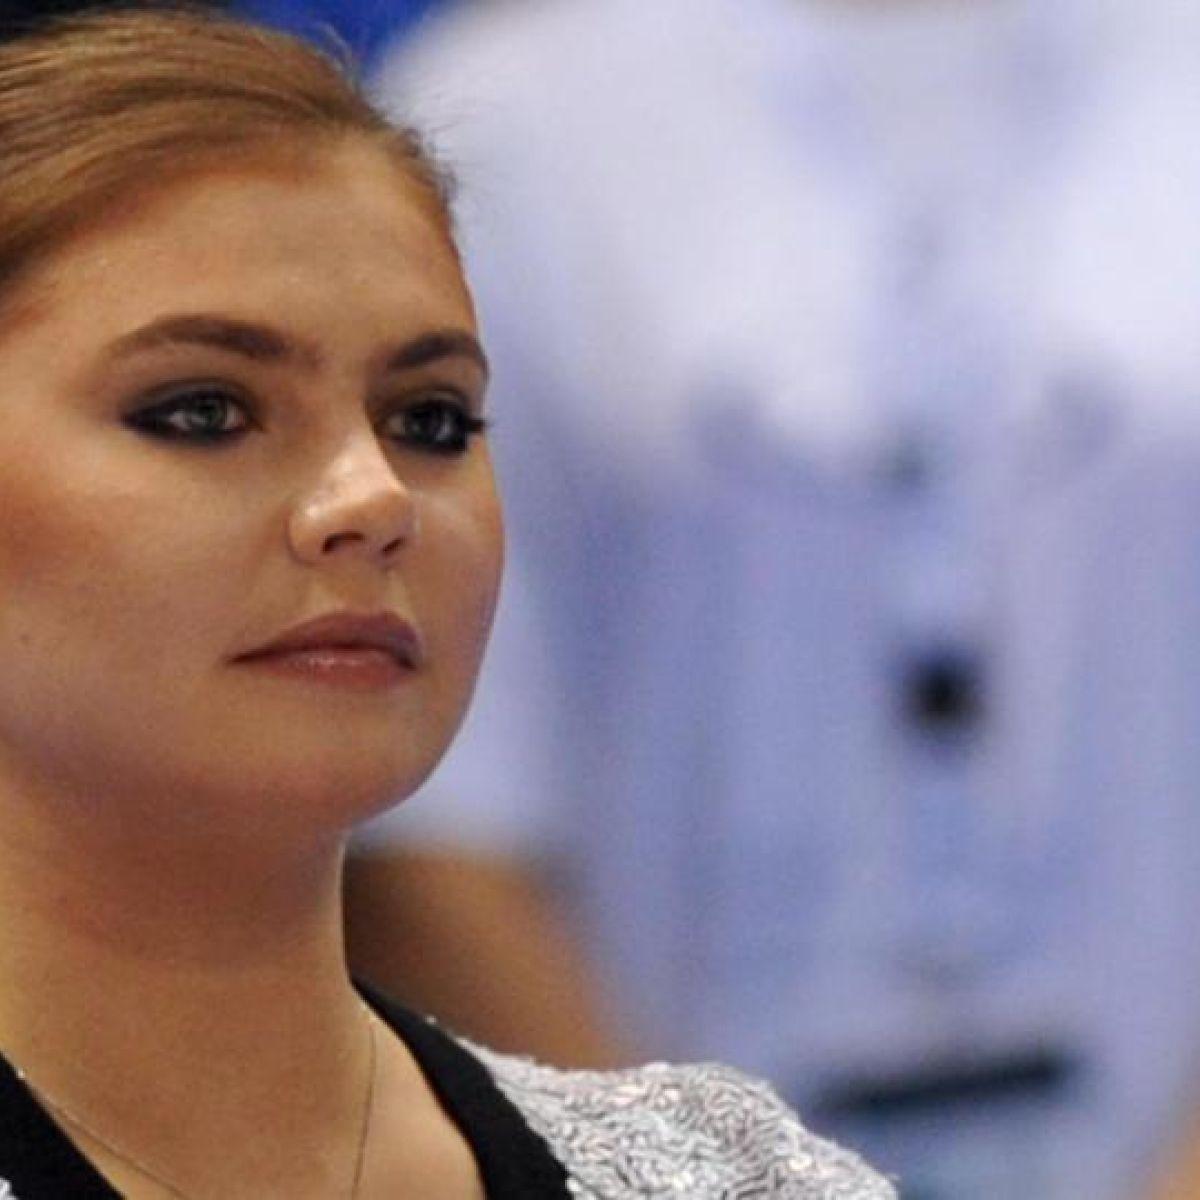 Alina Kabaeva showed a wedding ring